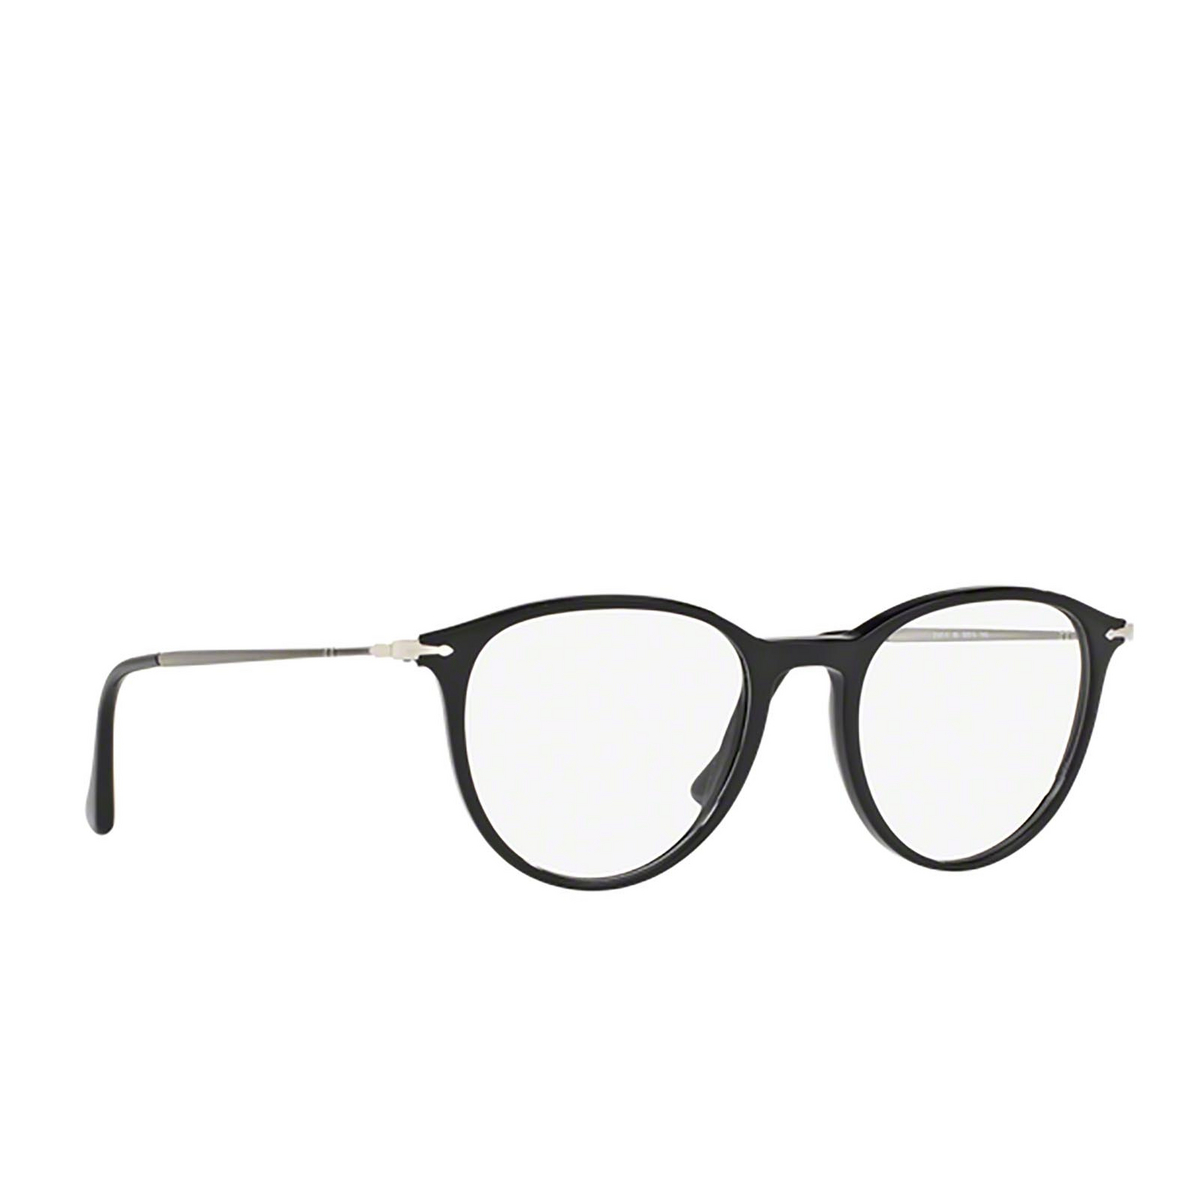 Persol® Rectangle Eyeglasses: PO3147V color Black 95 - three-quarters view.